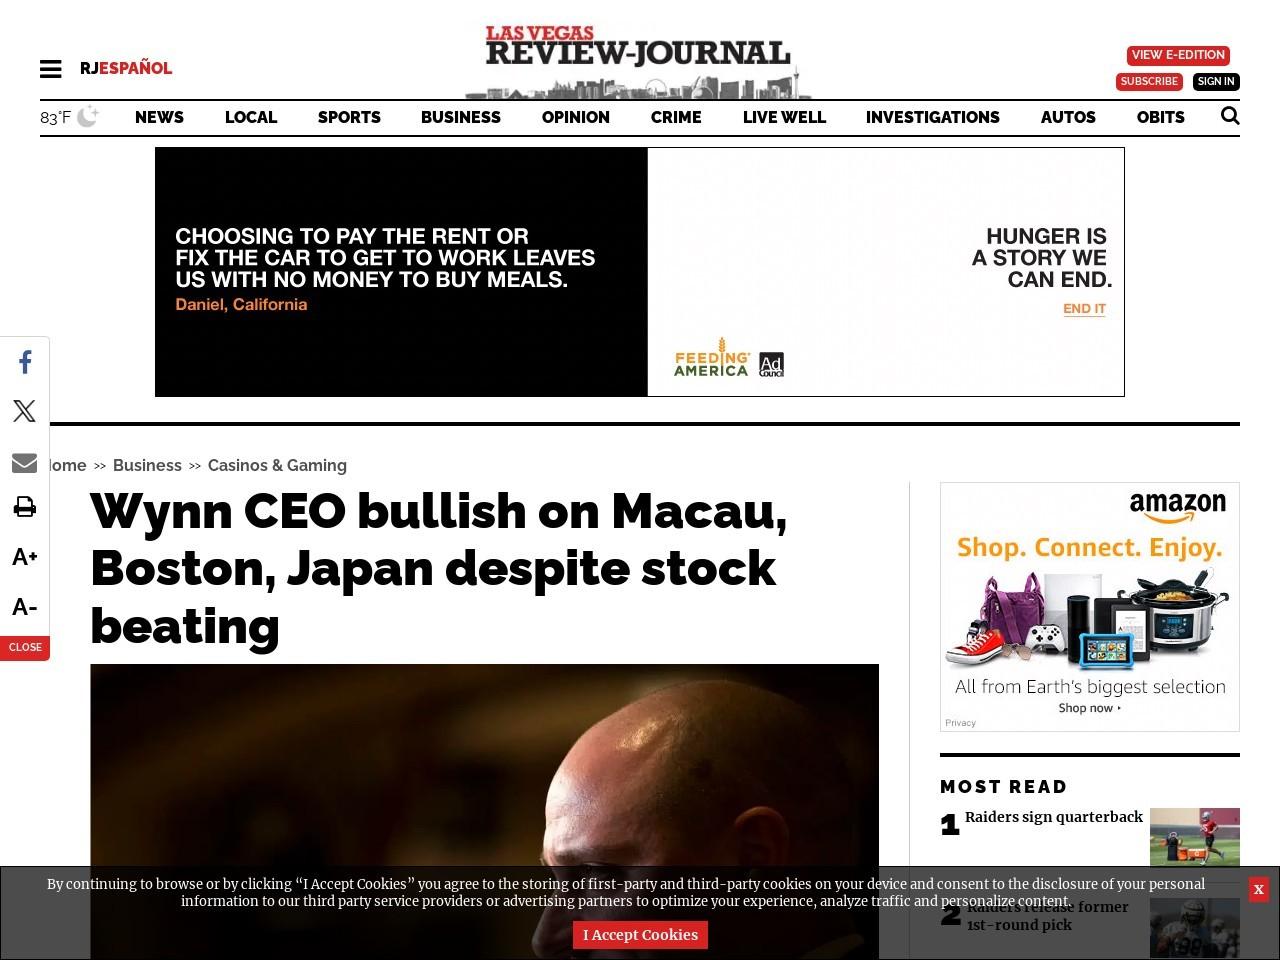 Wynn CEO bullish on Macau, Boston, Japan despite stock beating